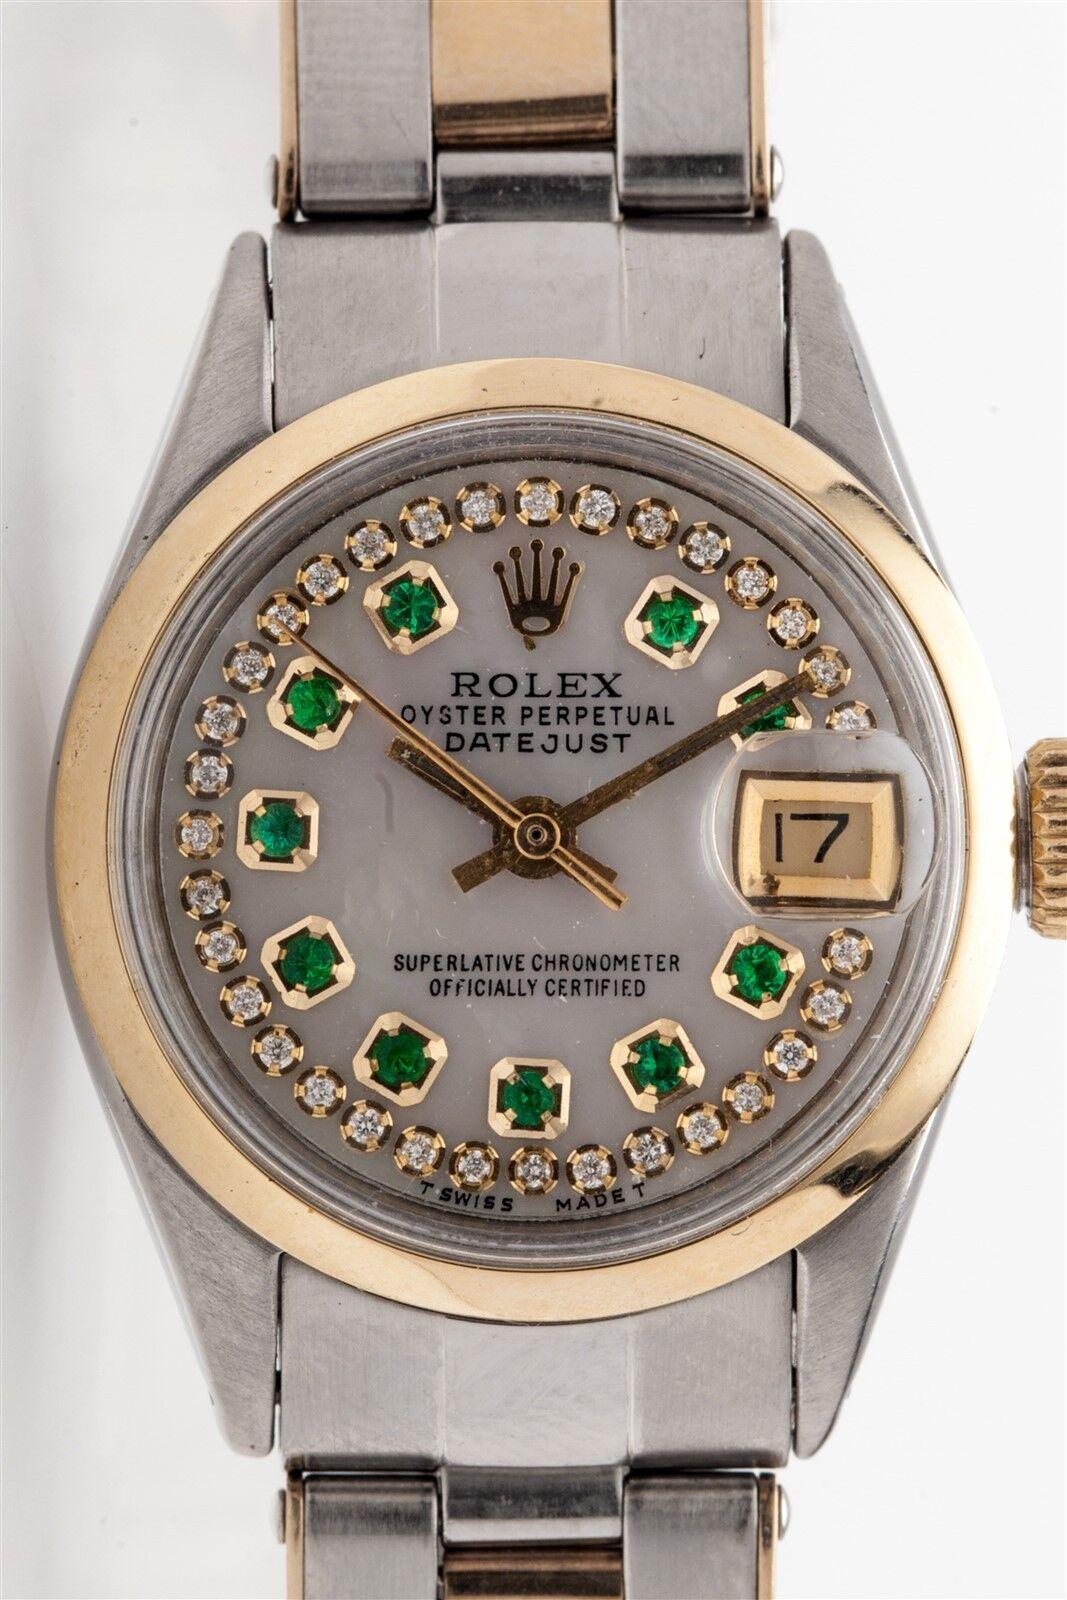 $2200.00 - $7000 14k Yellow Gold SS Rolex Ladies Datejust Emerald Diamond Watch BOX & WTY